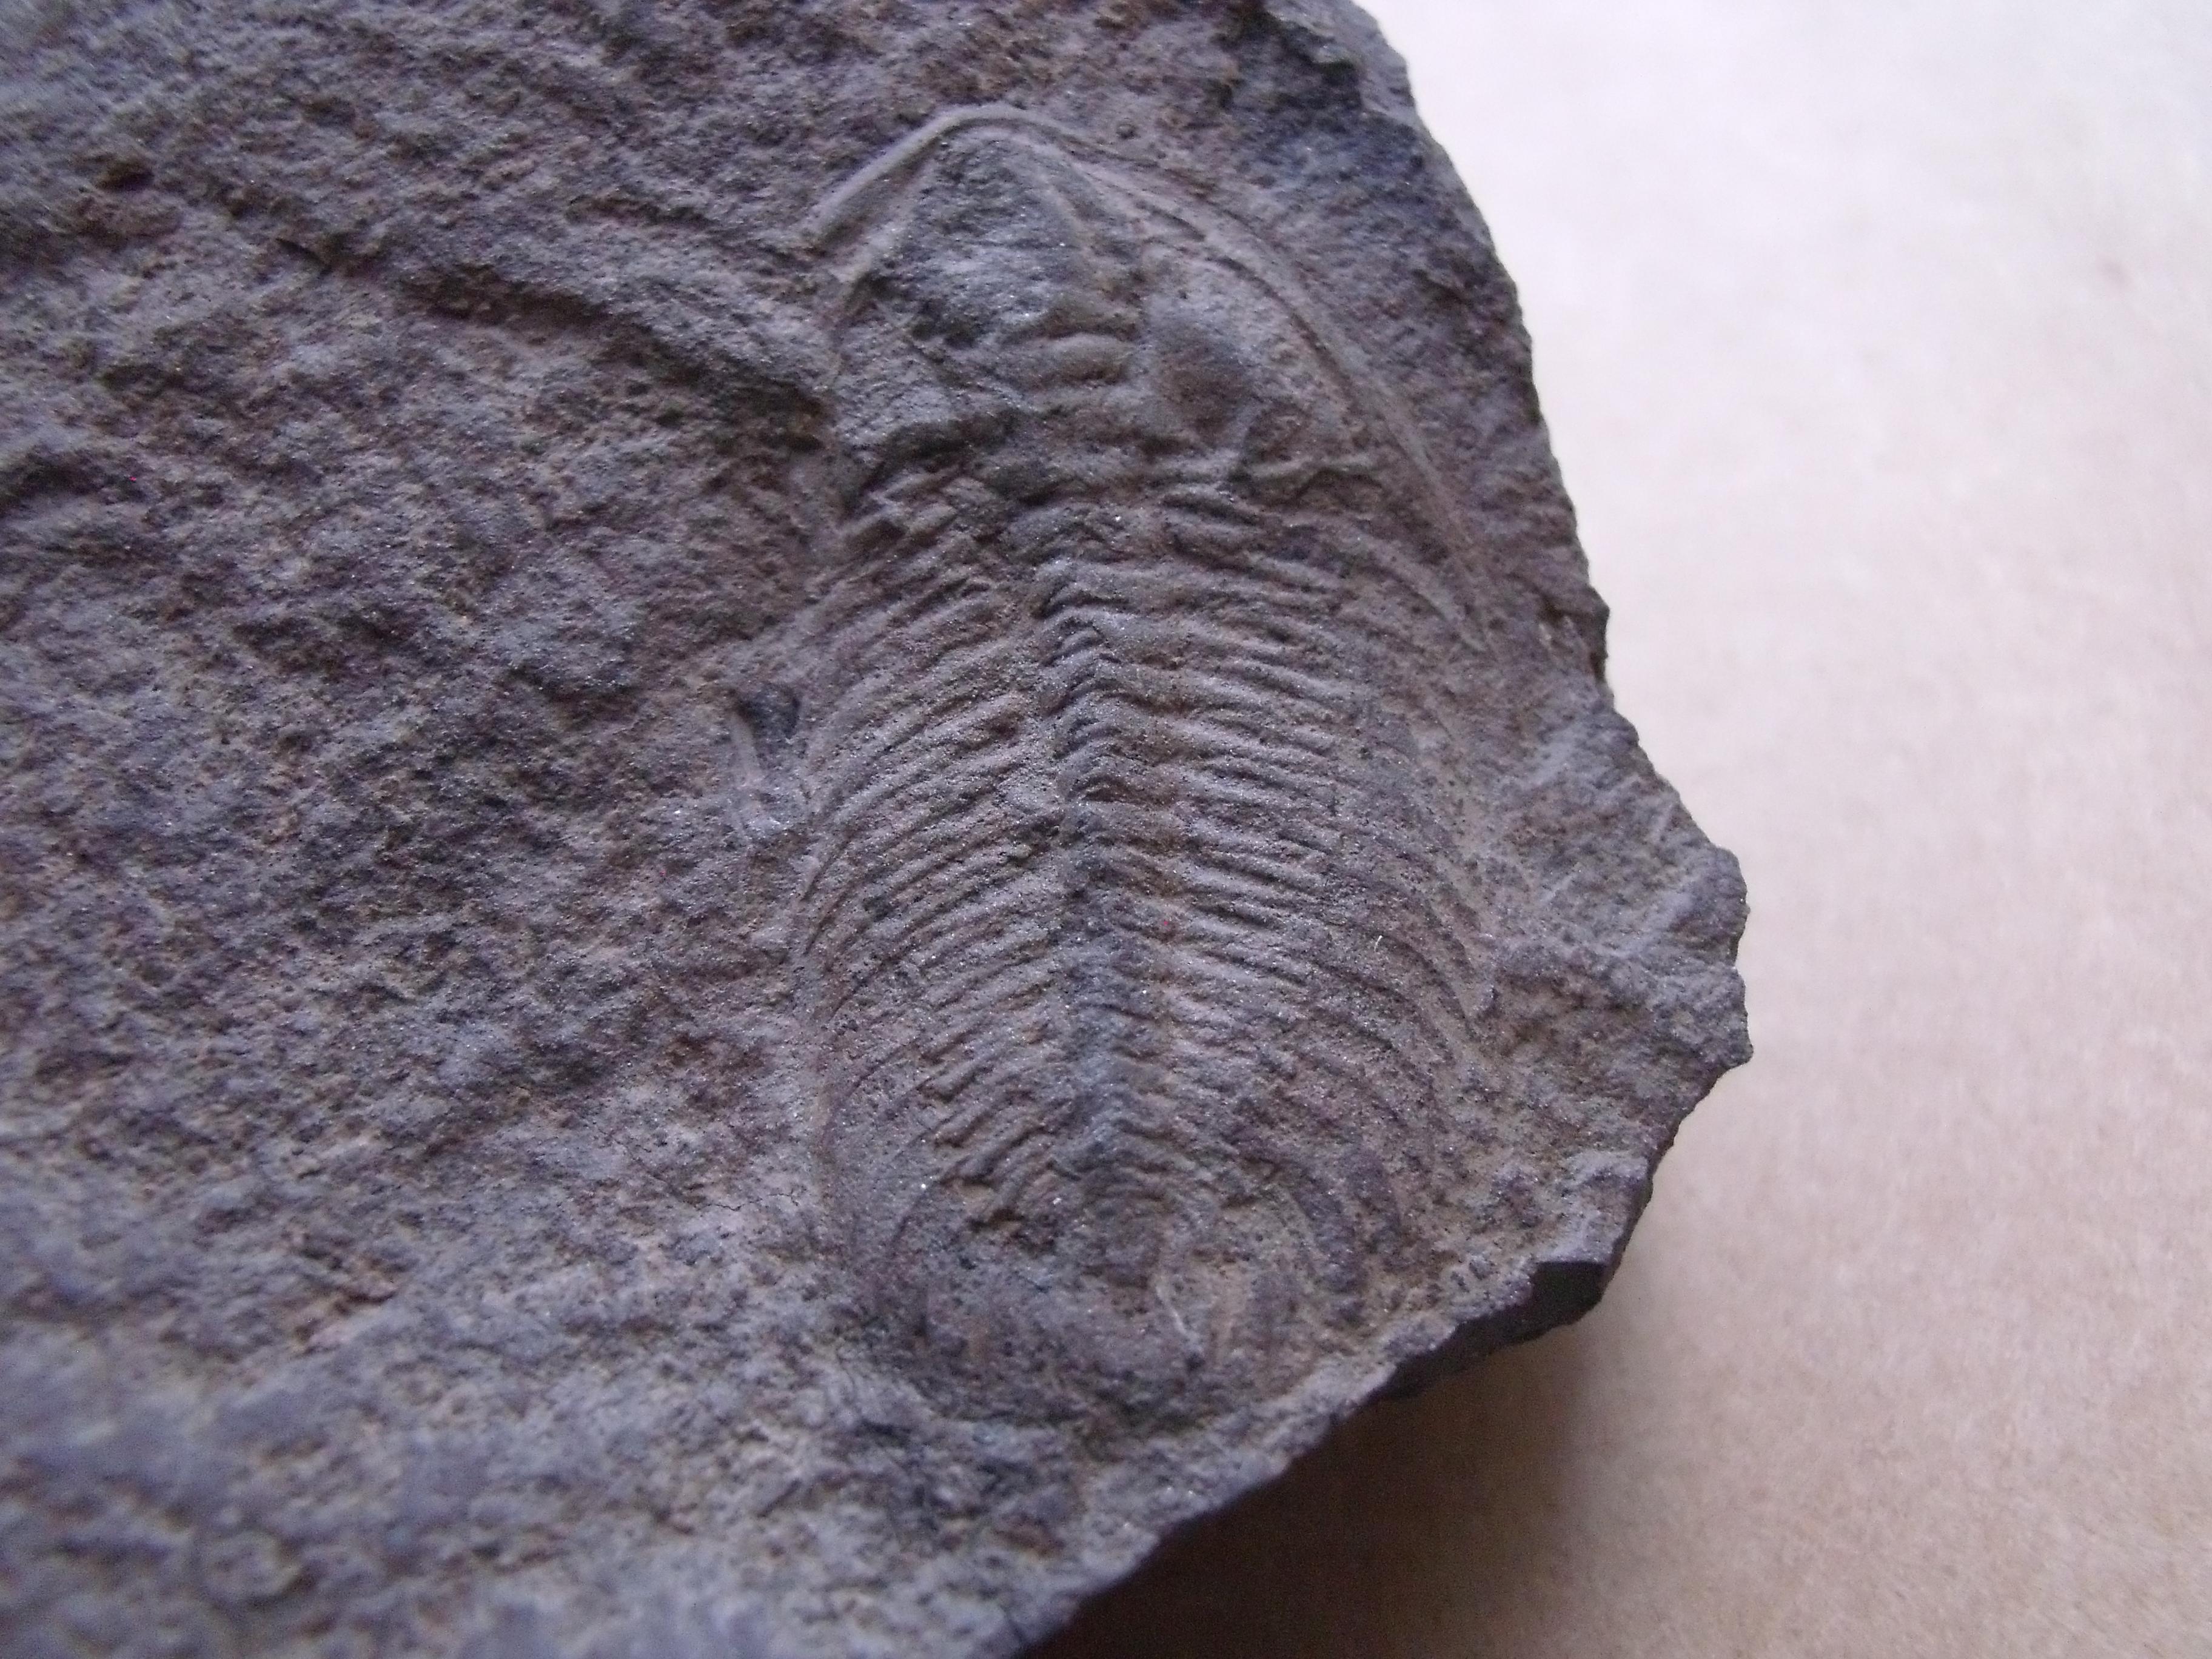 trilobit Eccaparadoxides pusillus, (lok.Rejkovice)